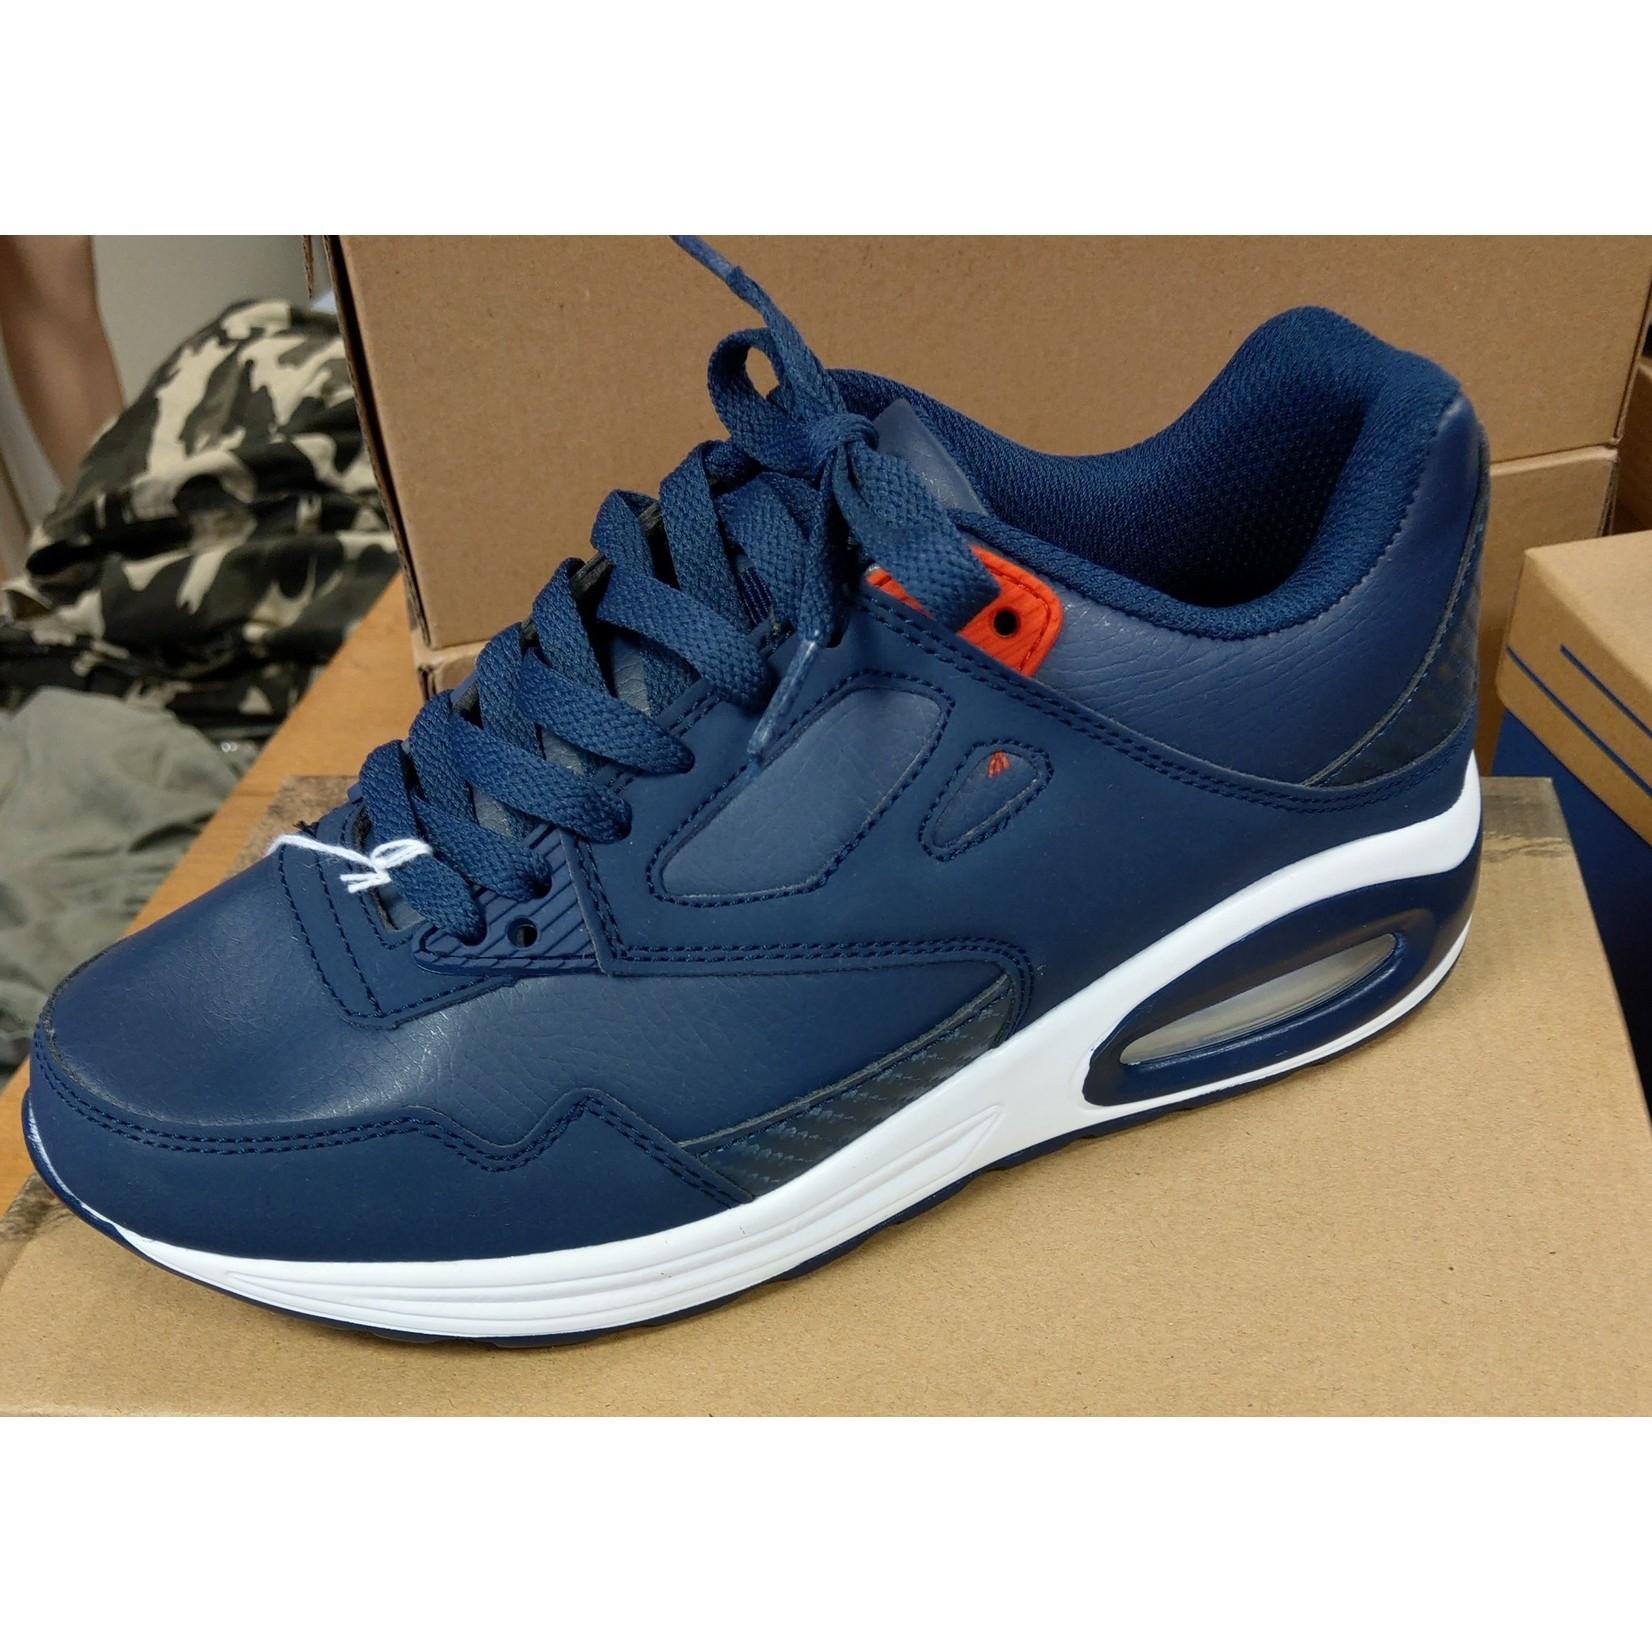 Sneaker unisex Blauw/Rood